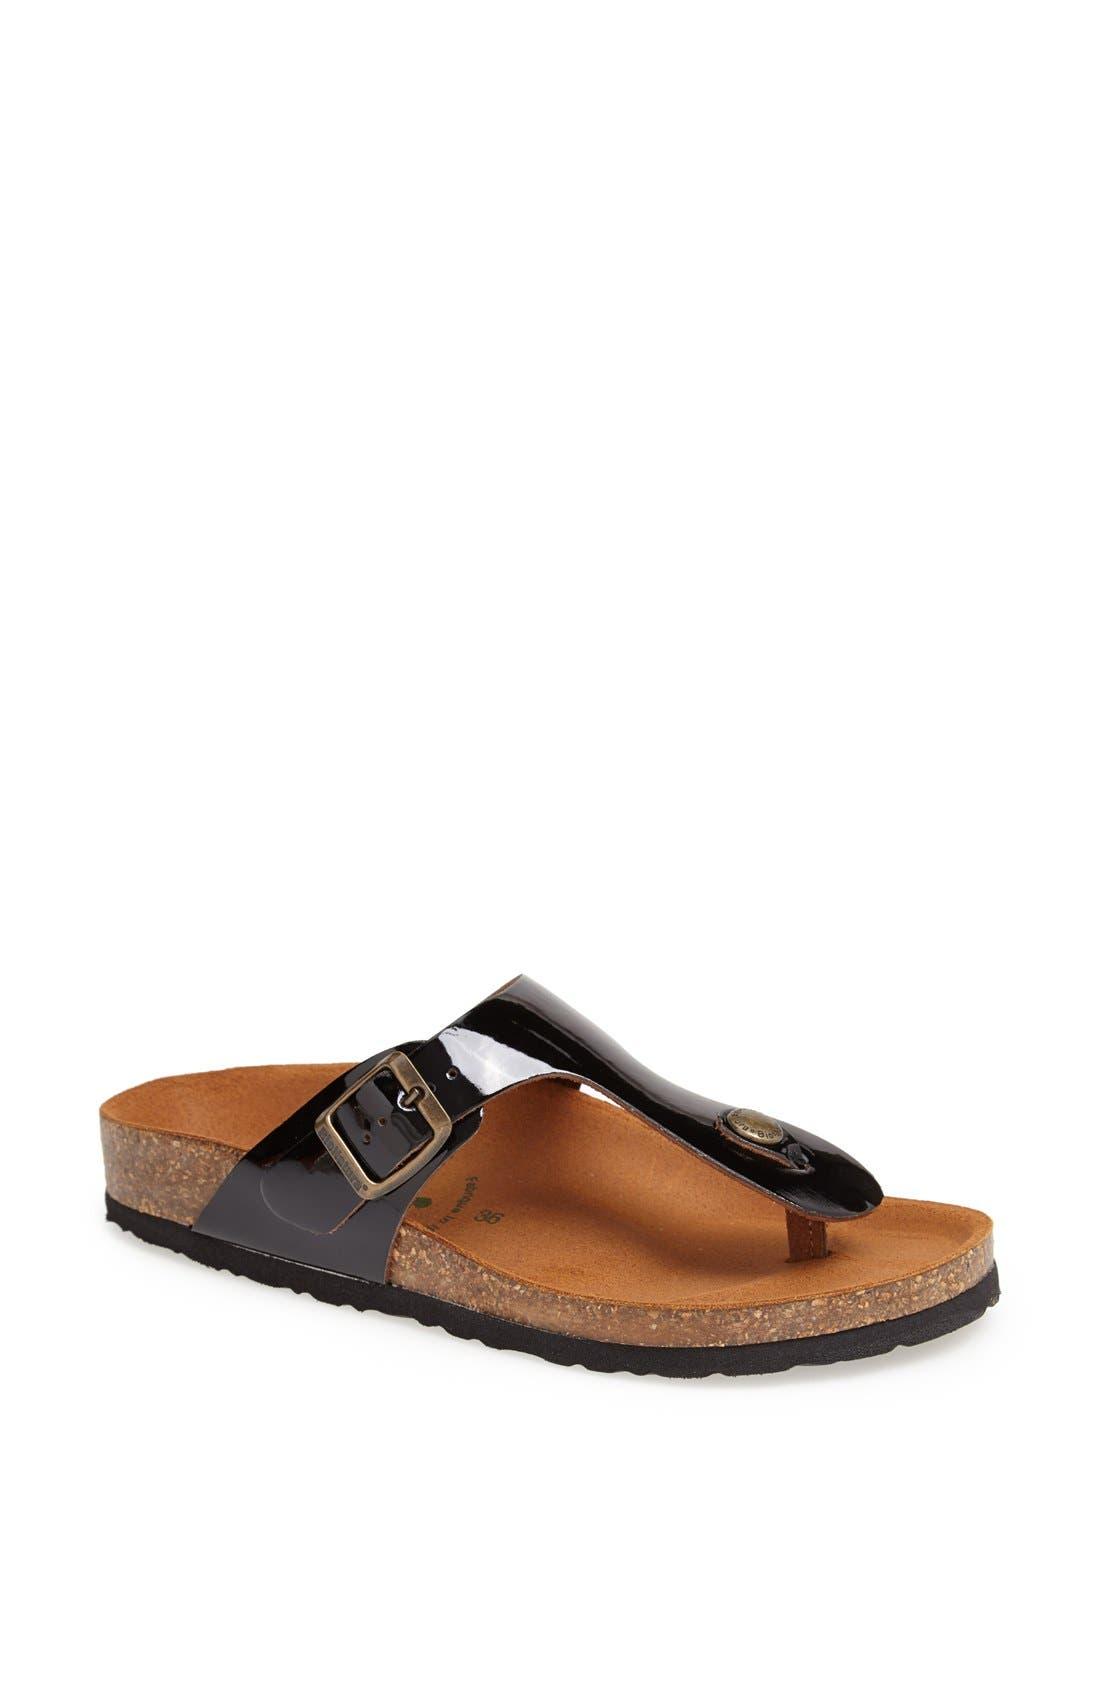 Alternate Image 1 Selected - BioNatura 'Finger' Thong Sandal